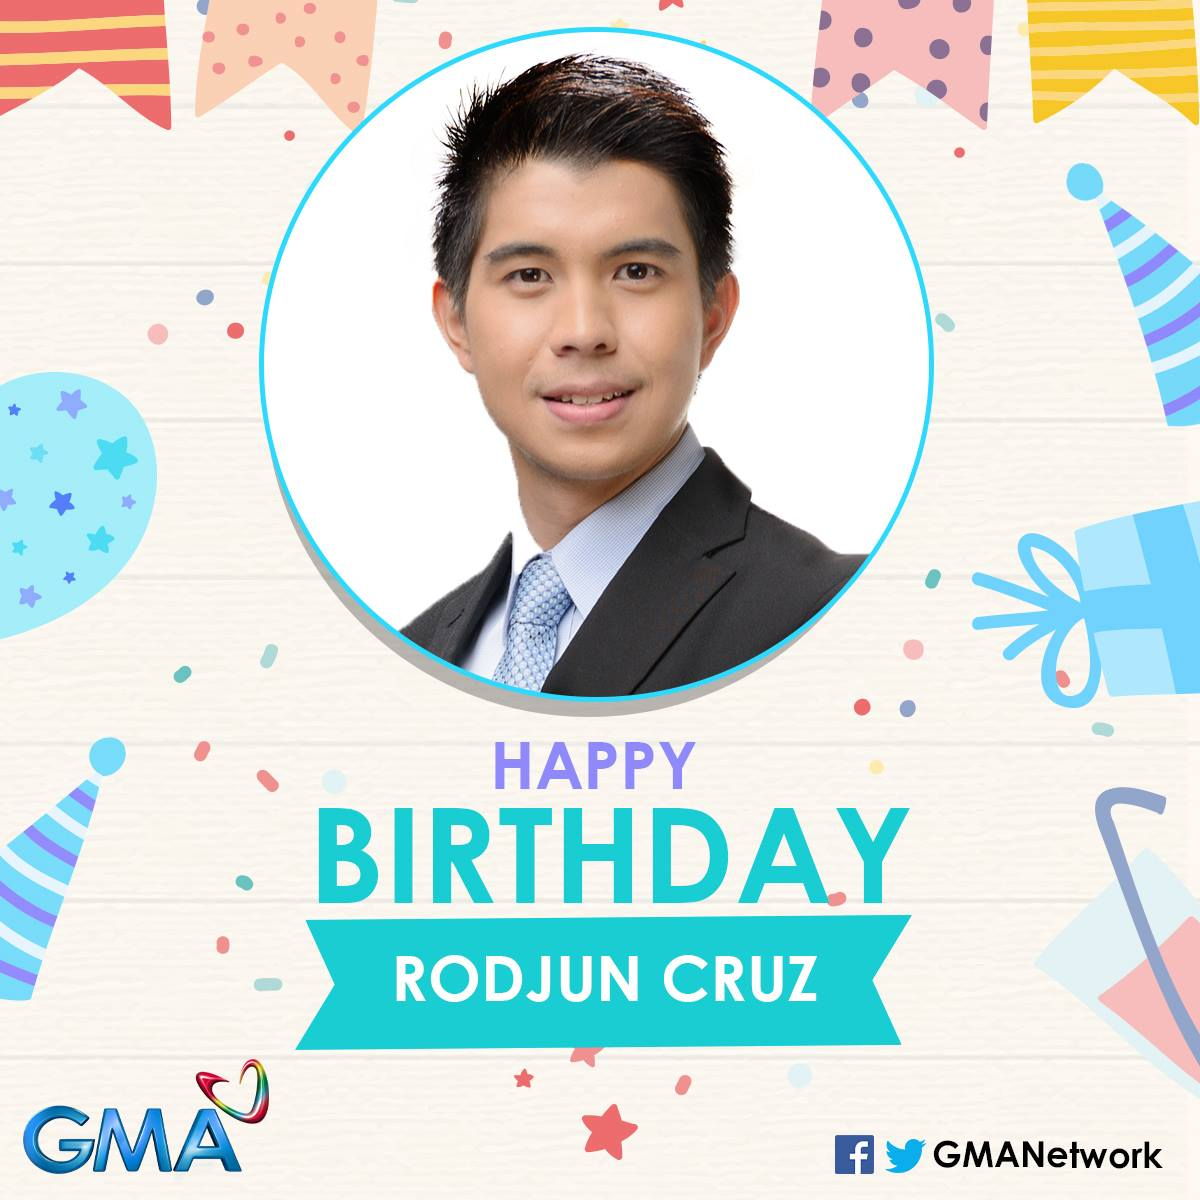 Happy birthday, Rodjun Cruz! We hope you have a great one!